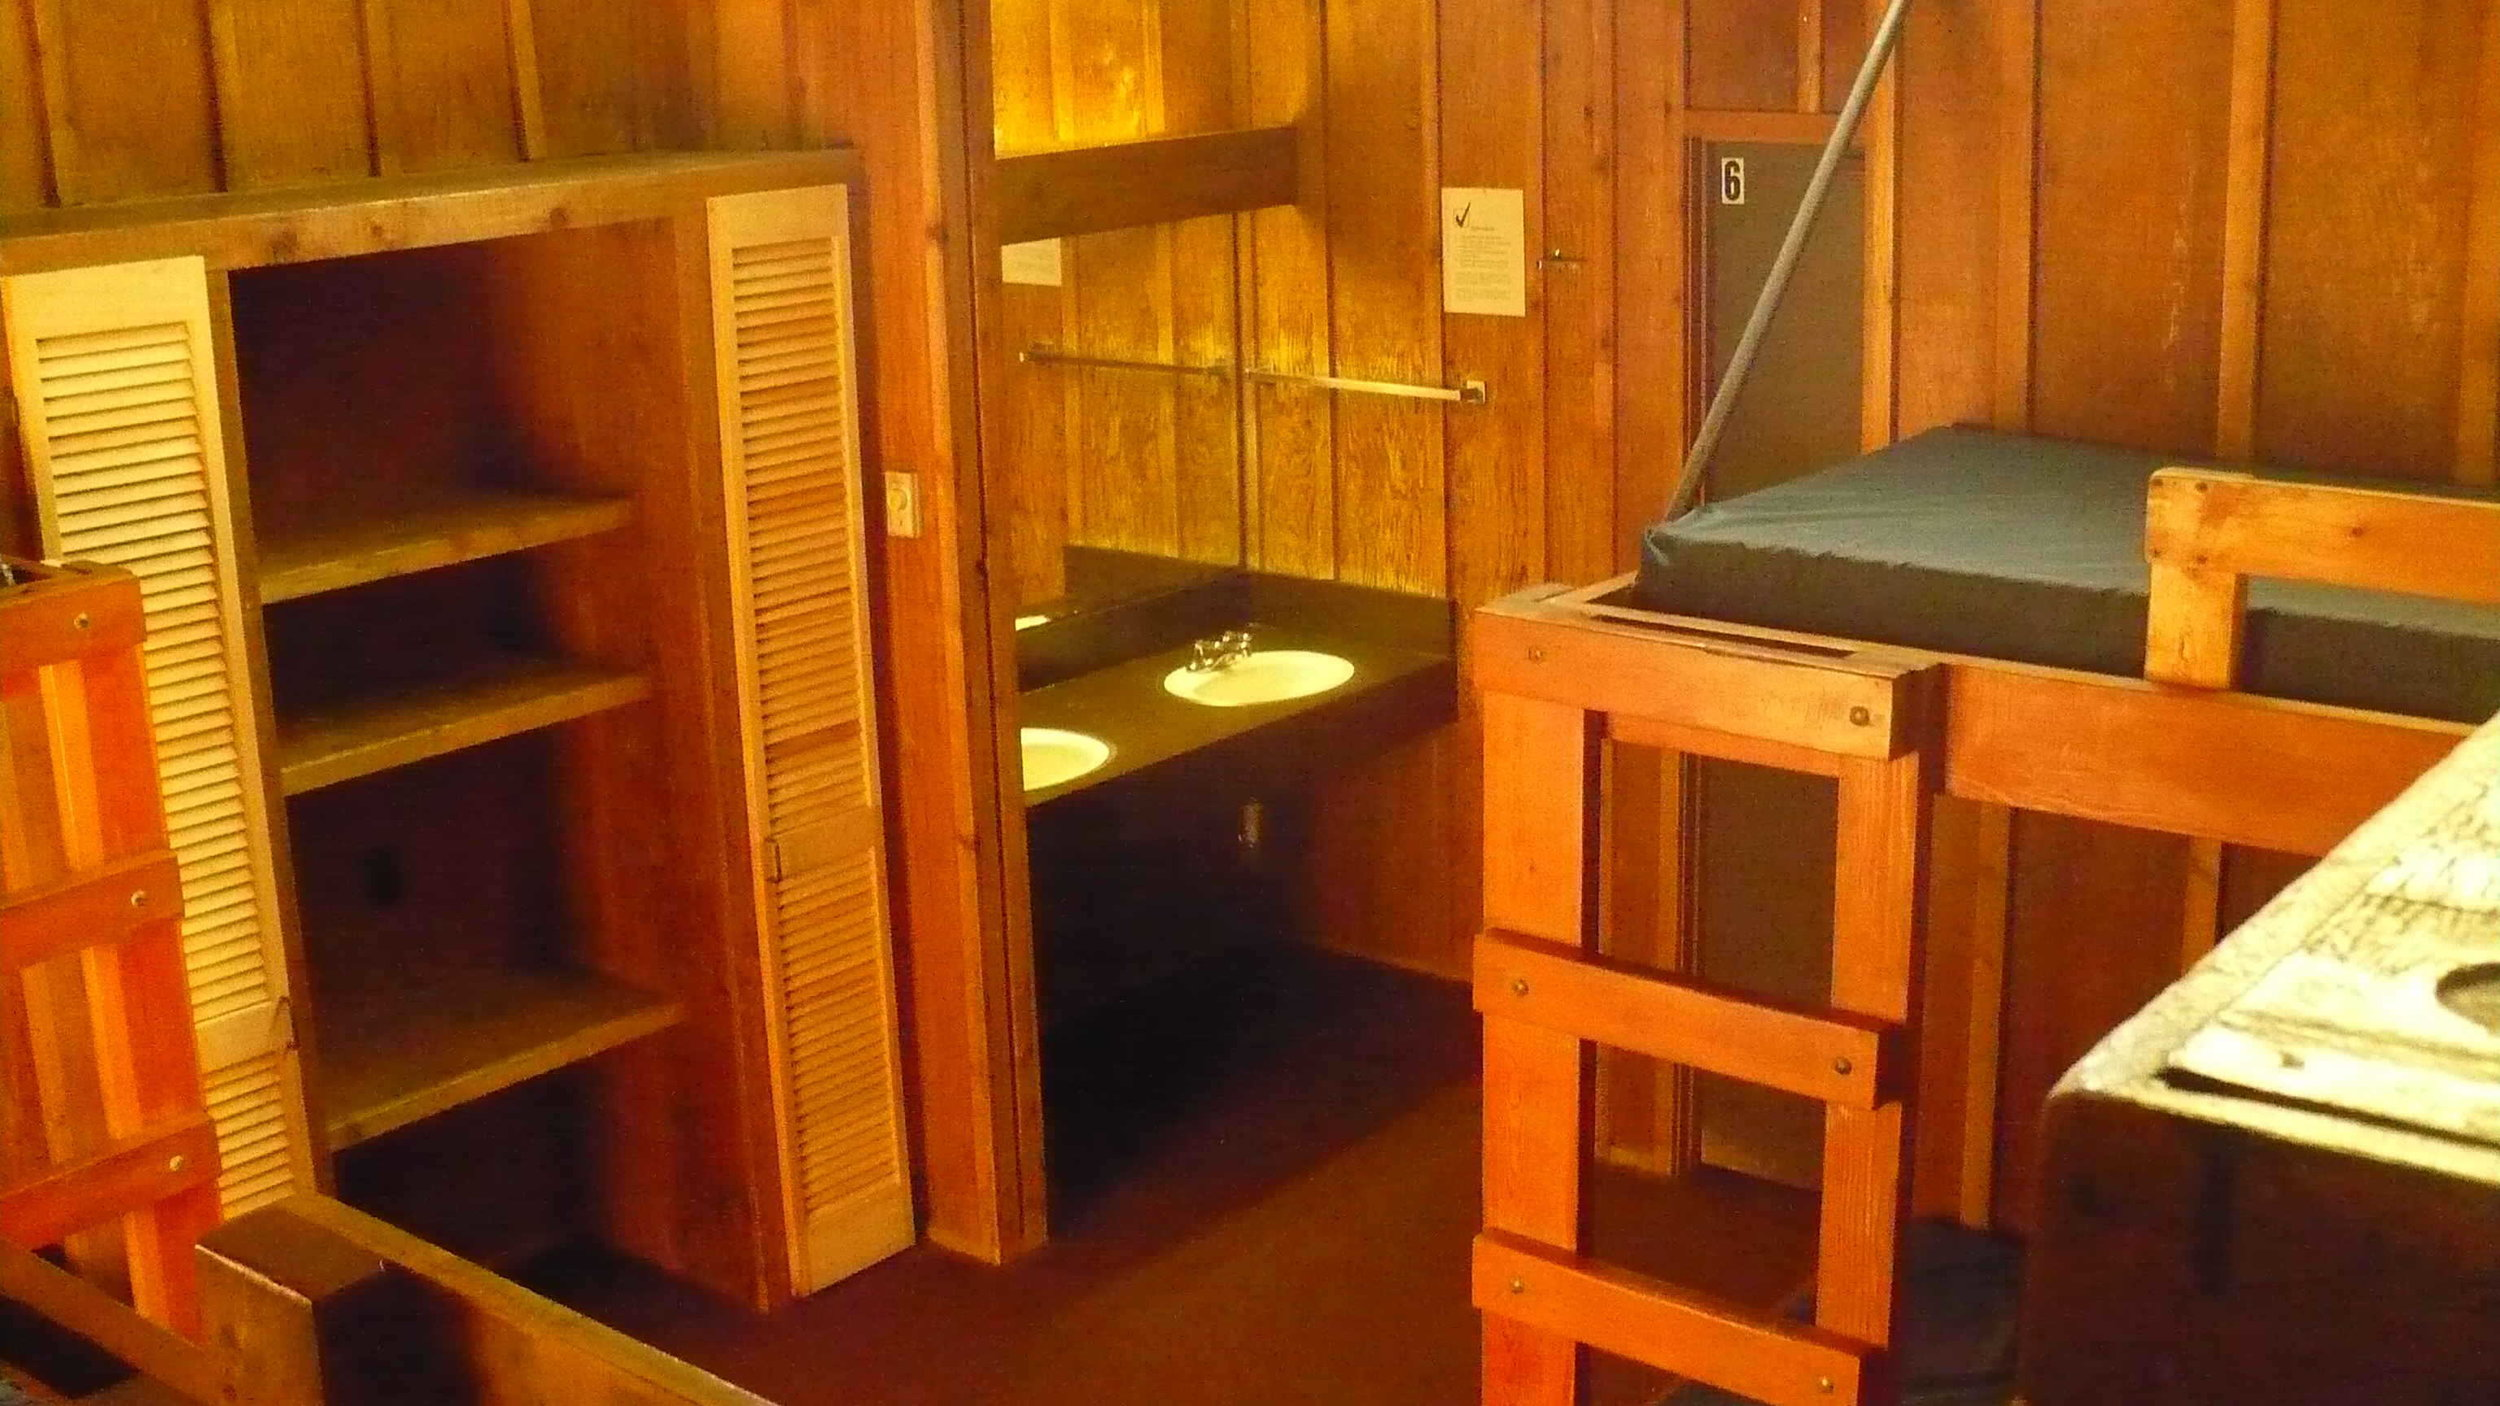 Lodge Bunks and Sinks.JPG